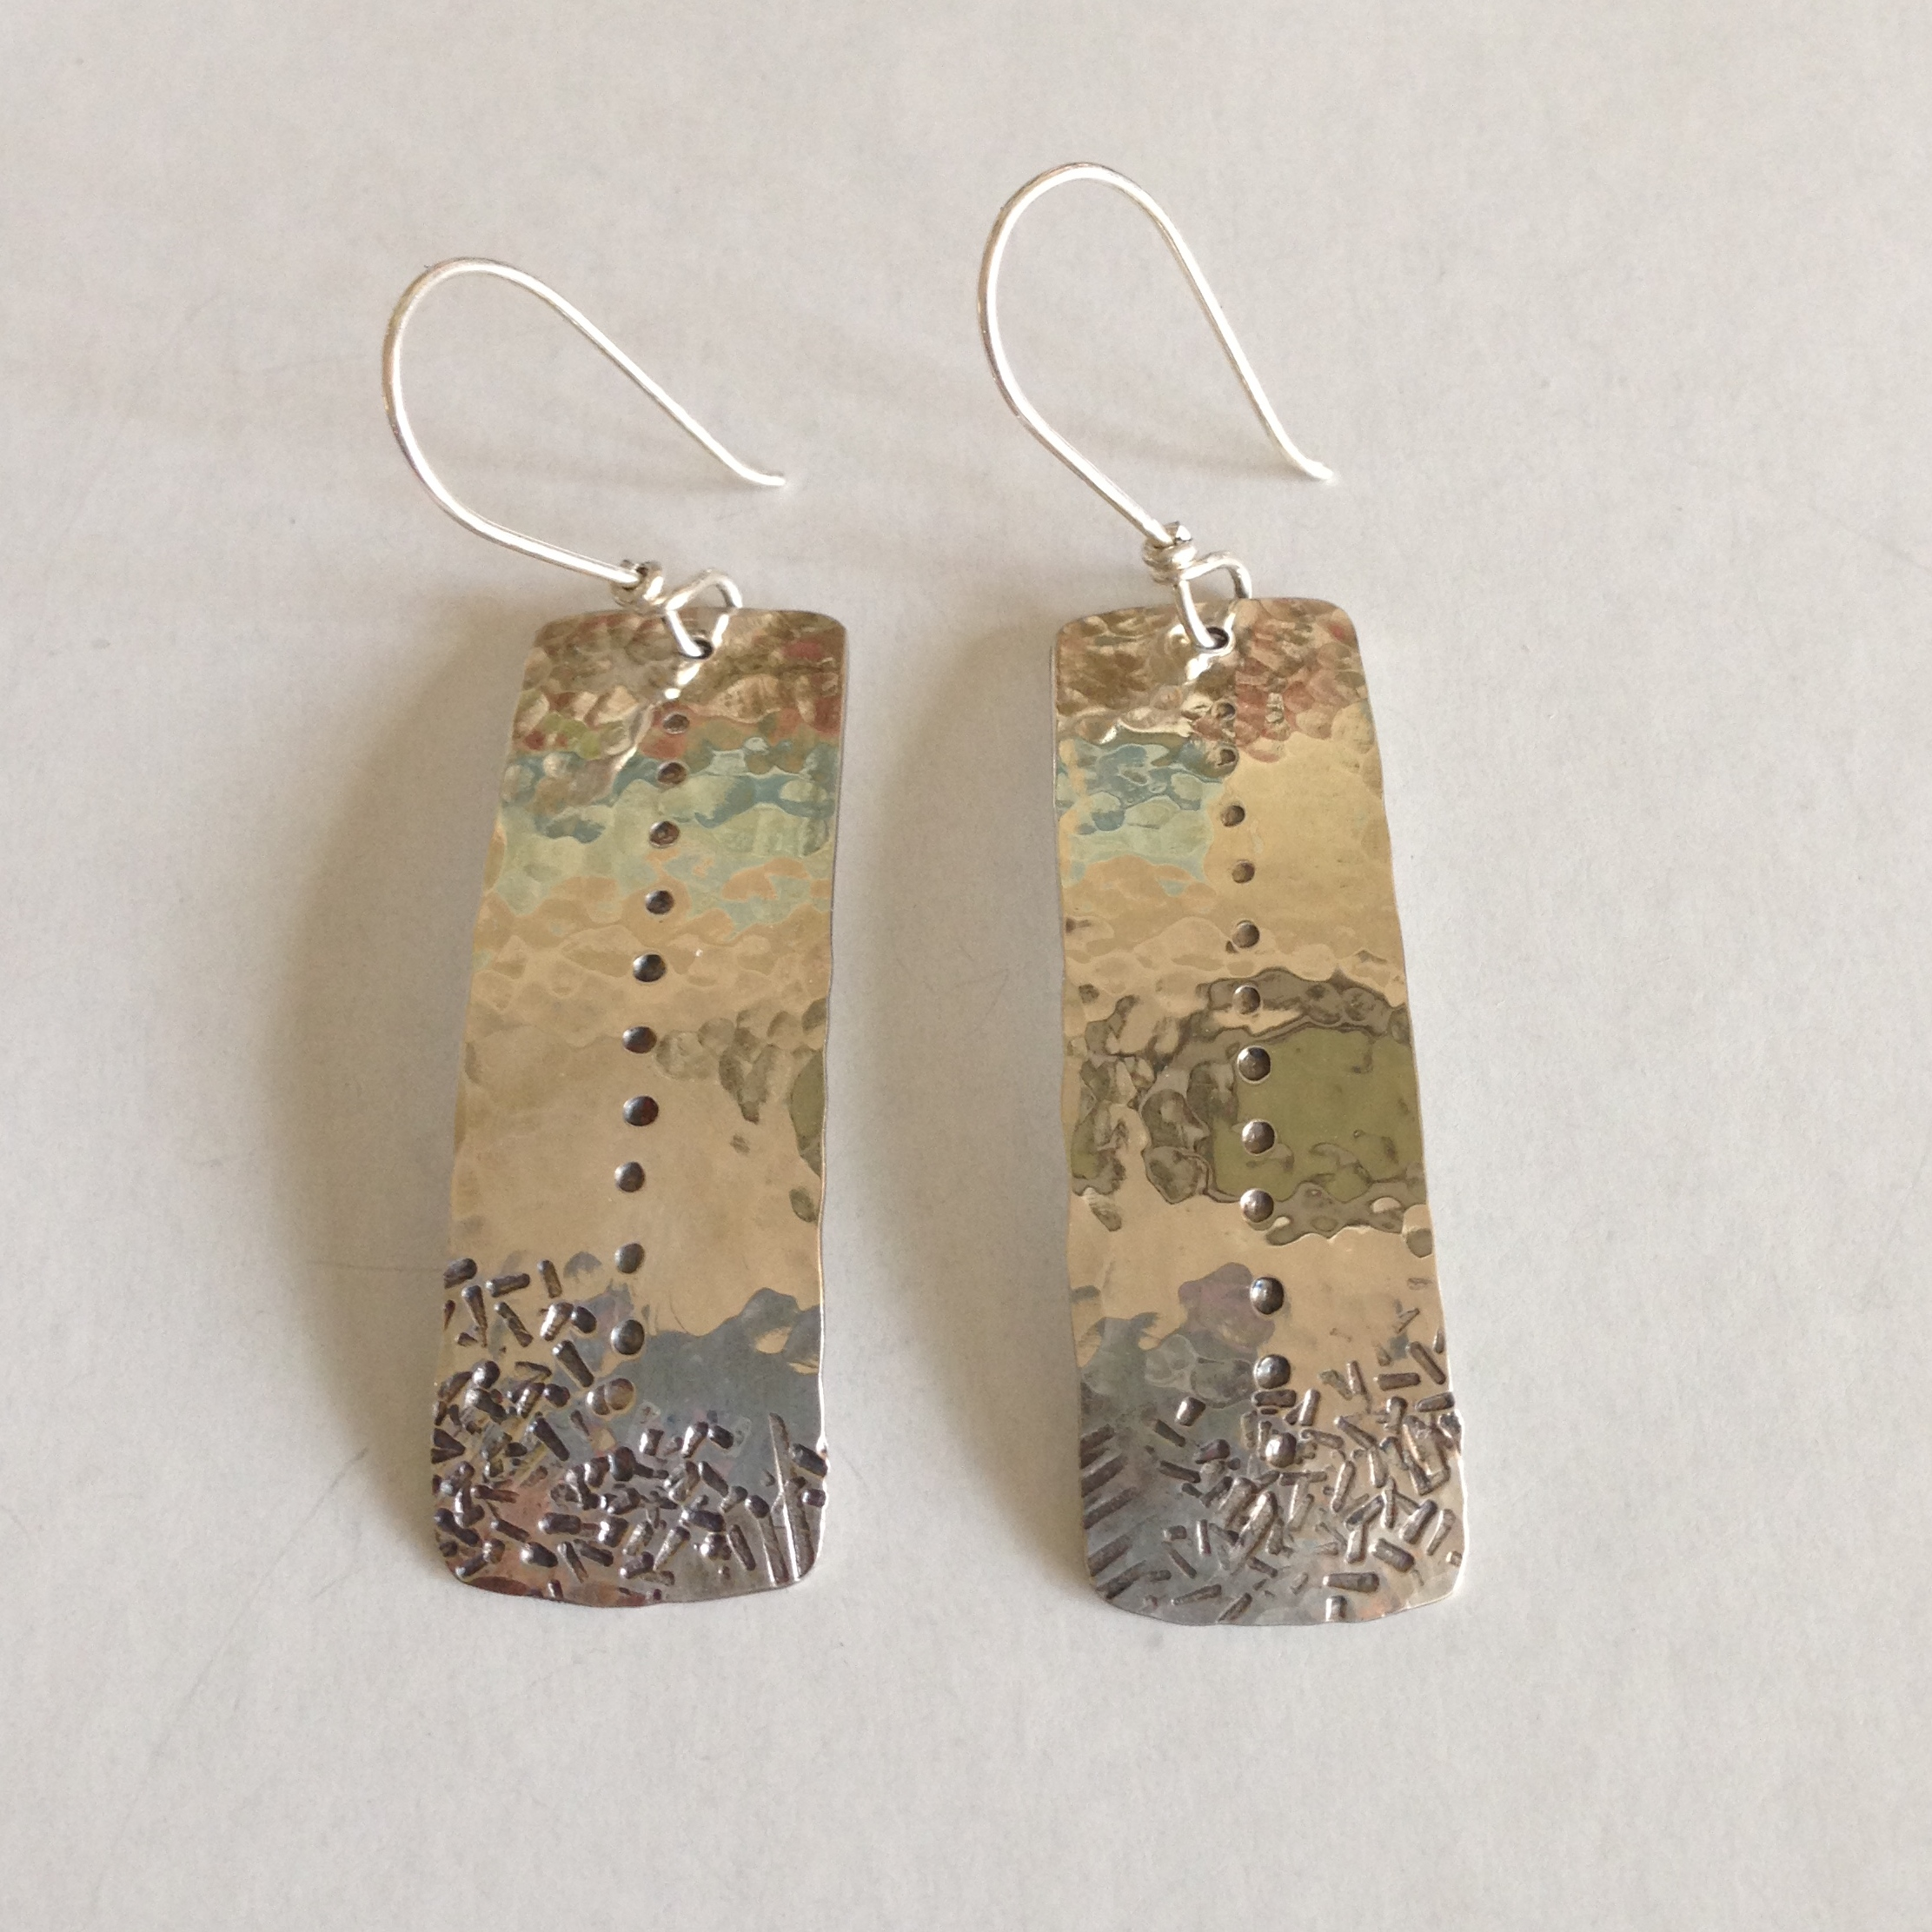 texture-rectangle-earrings